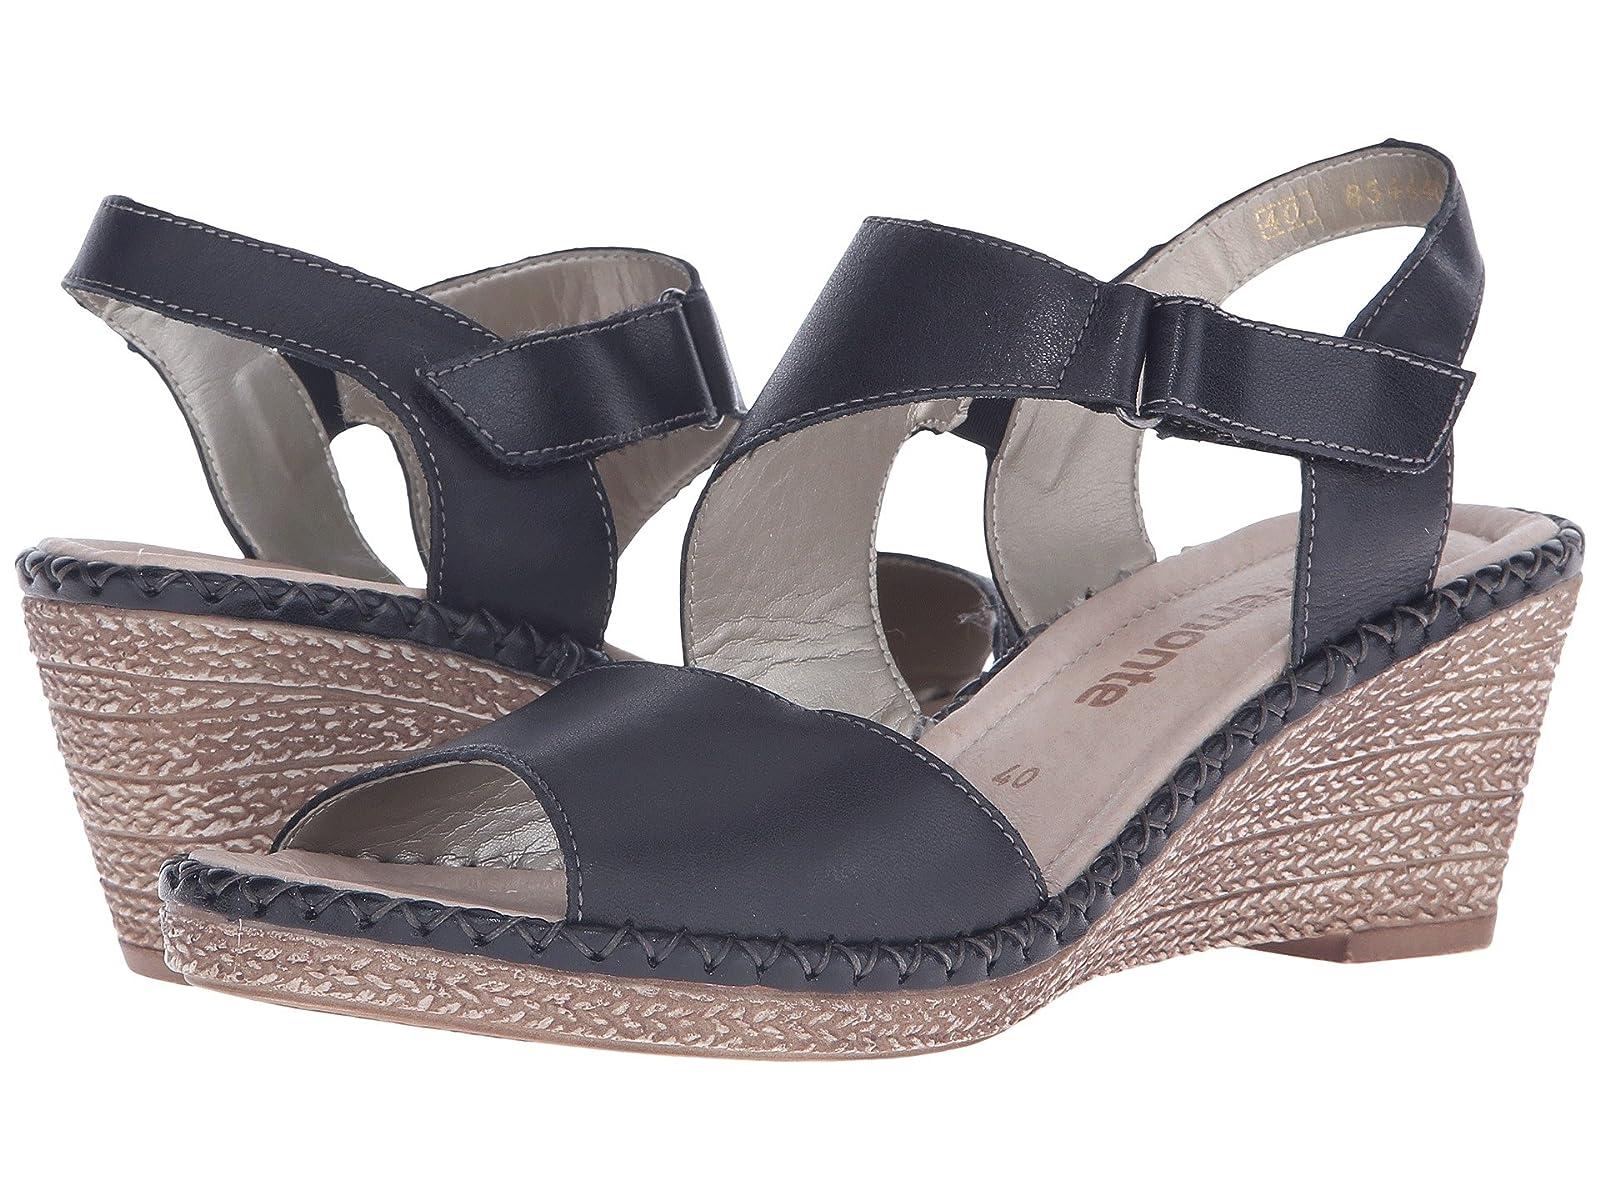 Rieker D6743 Ursula 43Cheap and distinctive eye-catching shoes